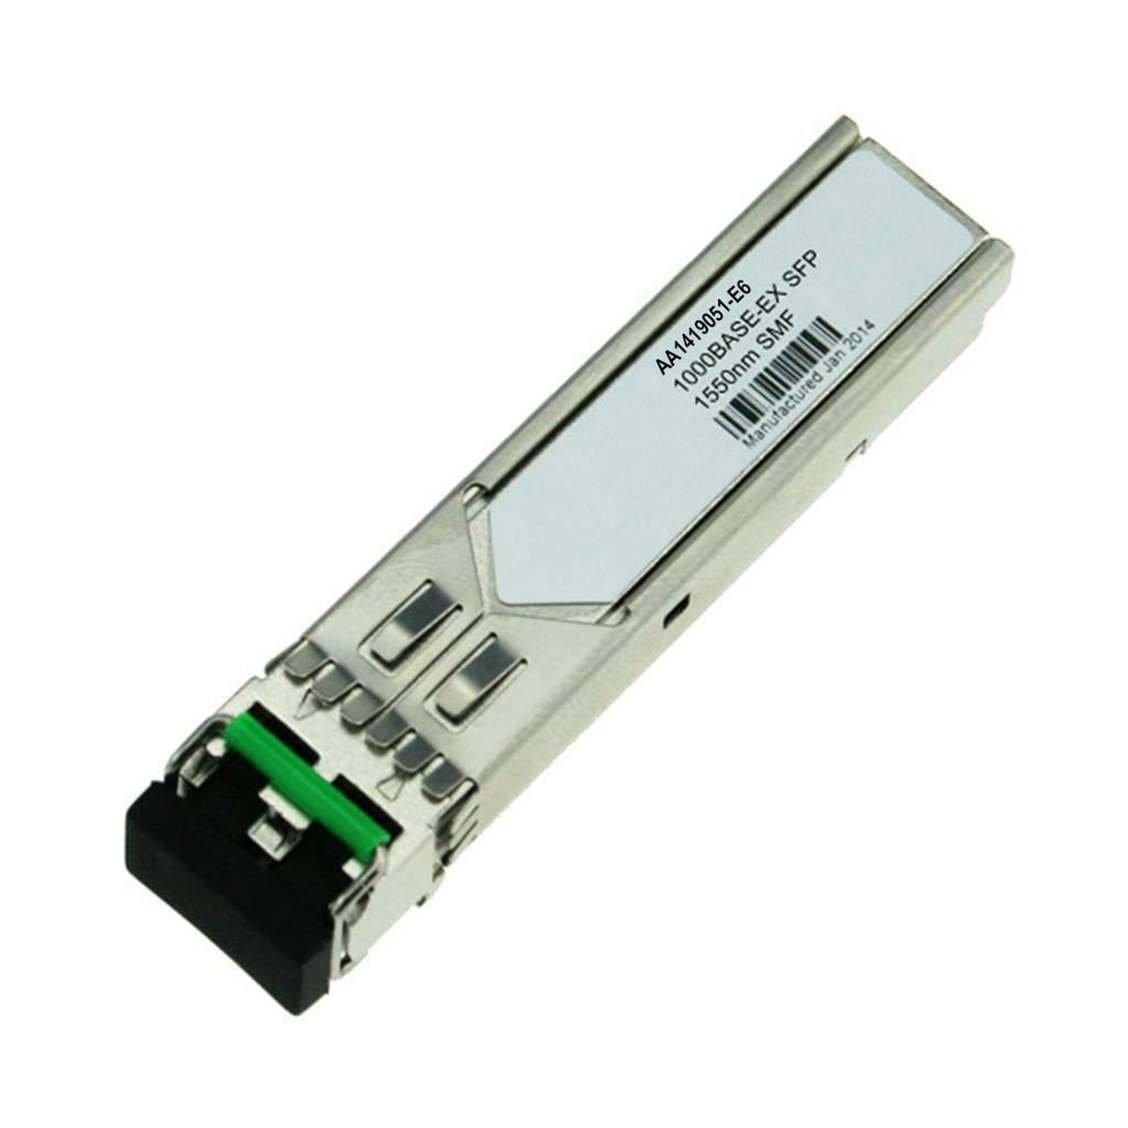 LODFIBER AA1419051-E6 Avaya Compatible 1000BASE-EX SFP 1550nm 40km DOM Transceiver